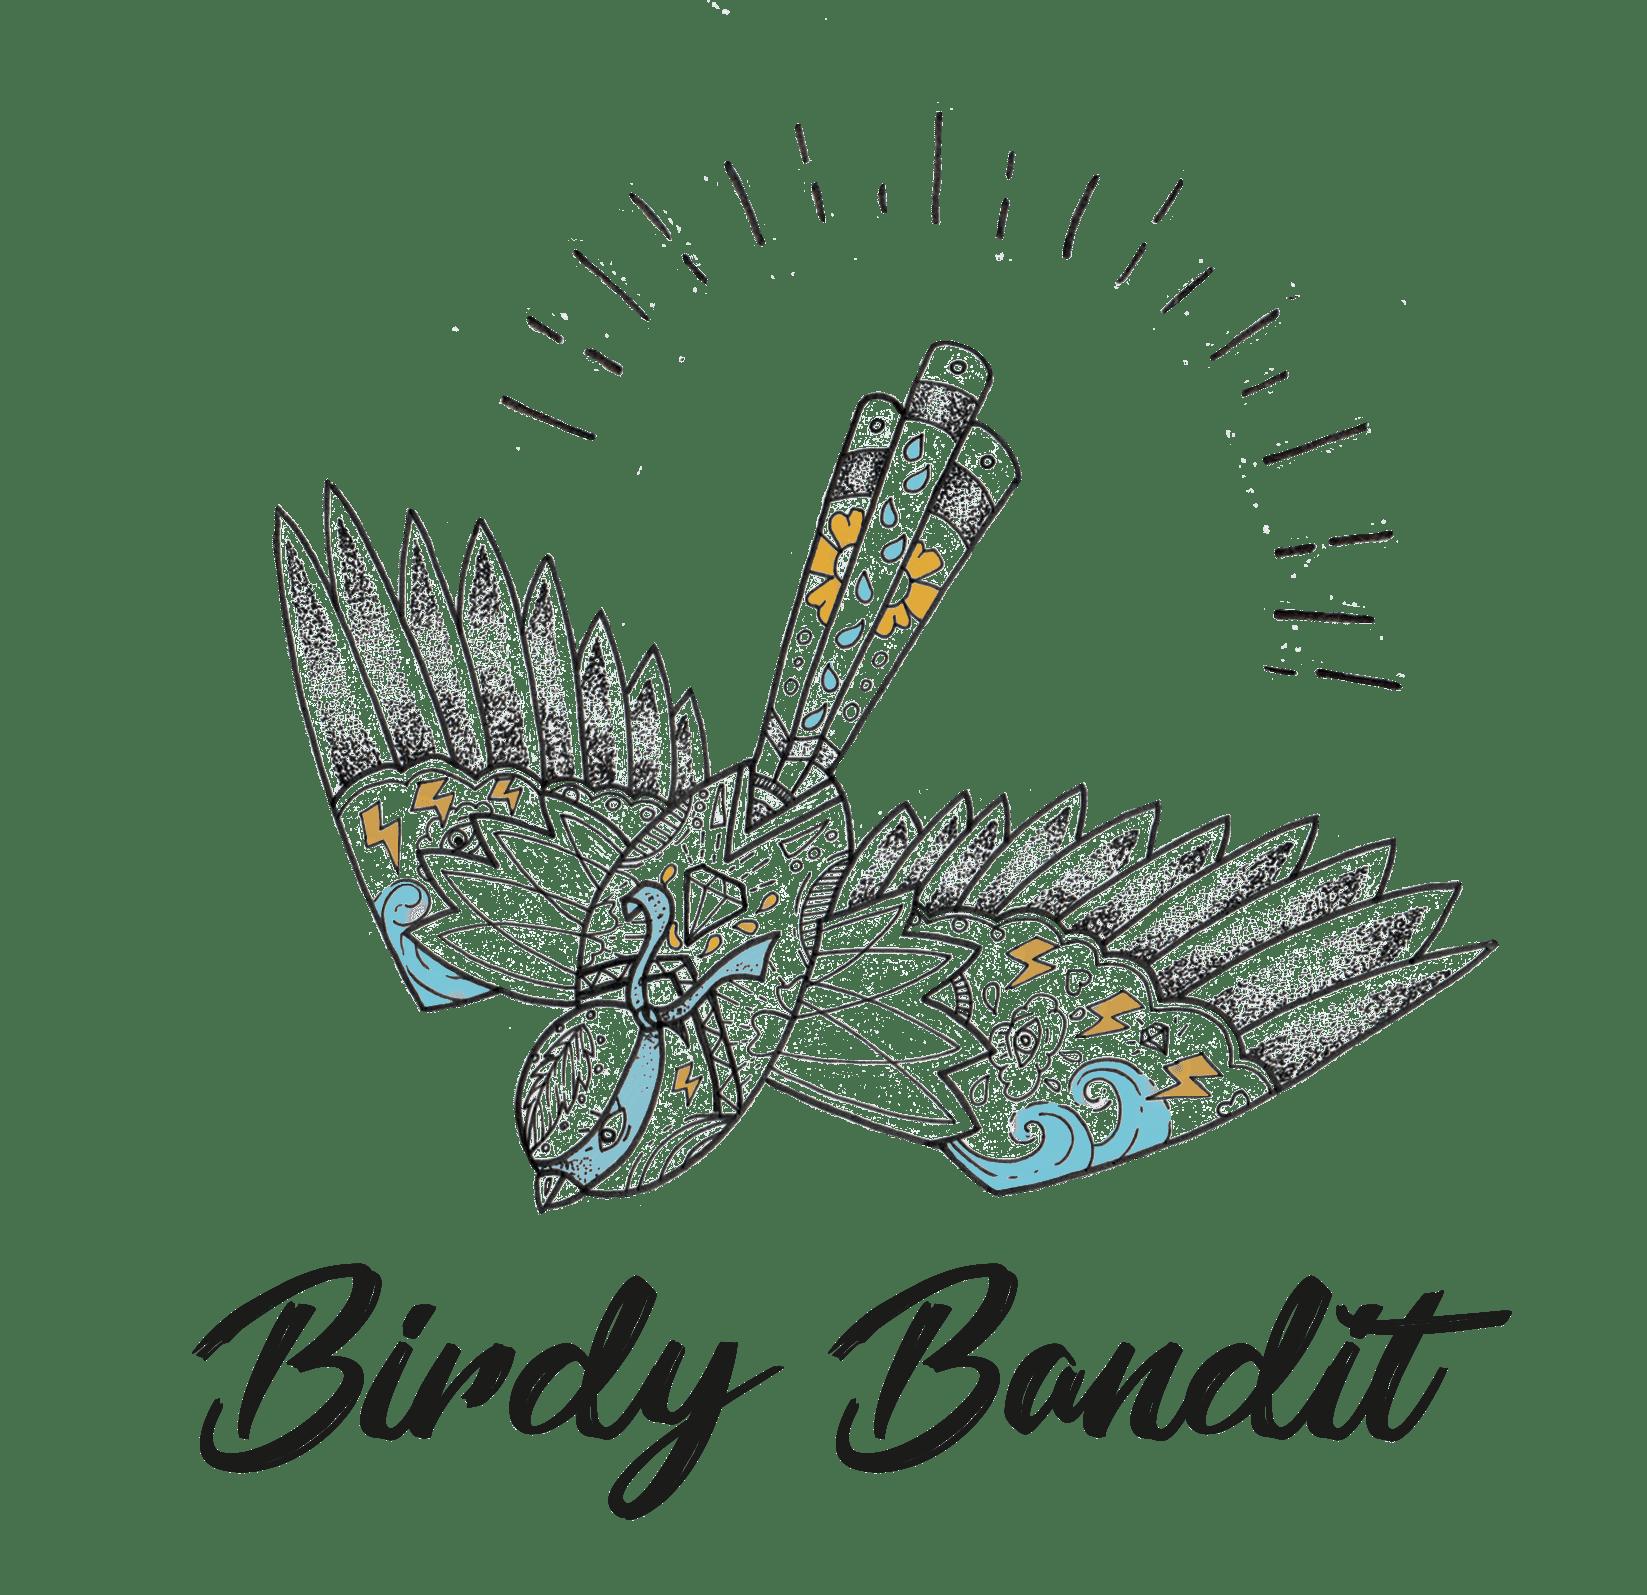 Birdy Bandit